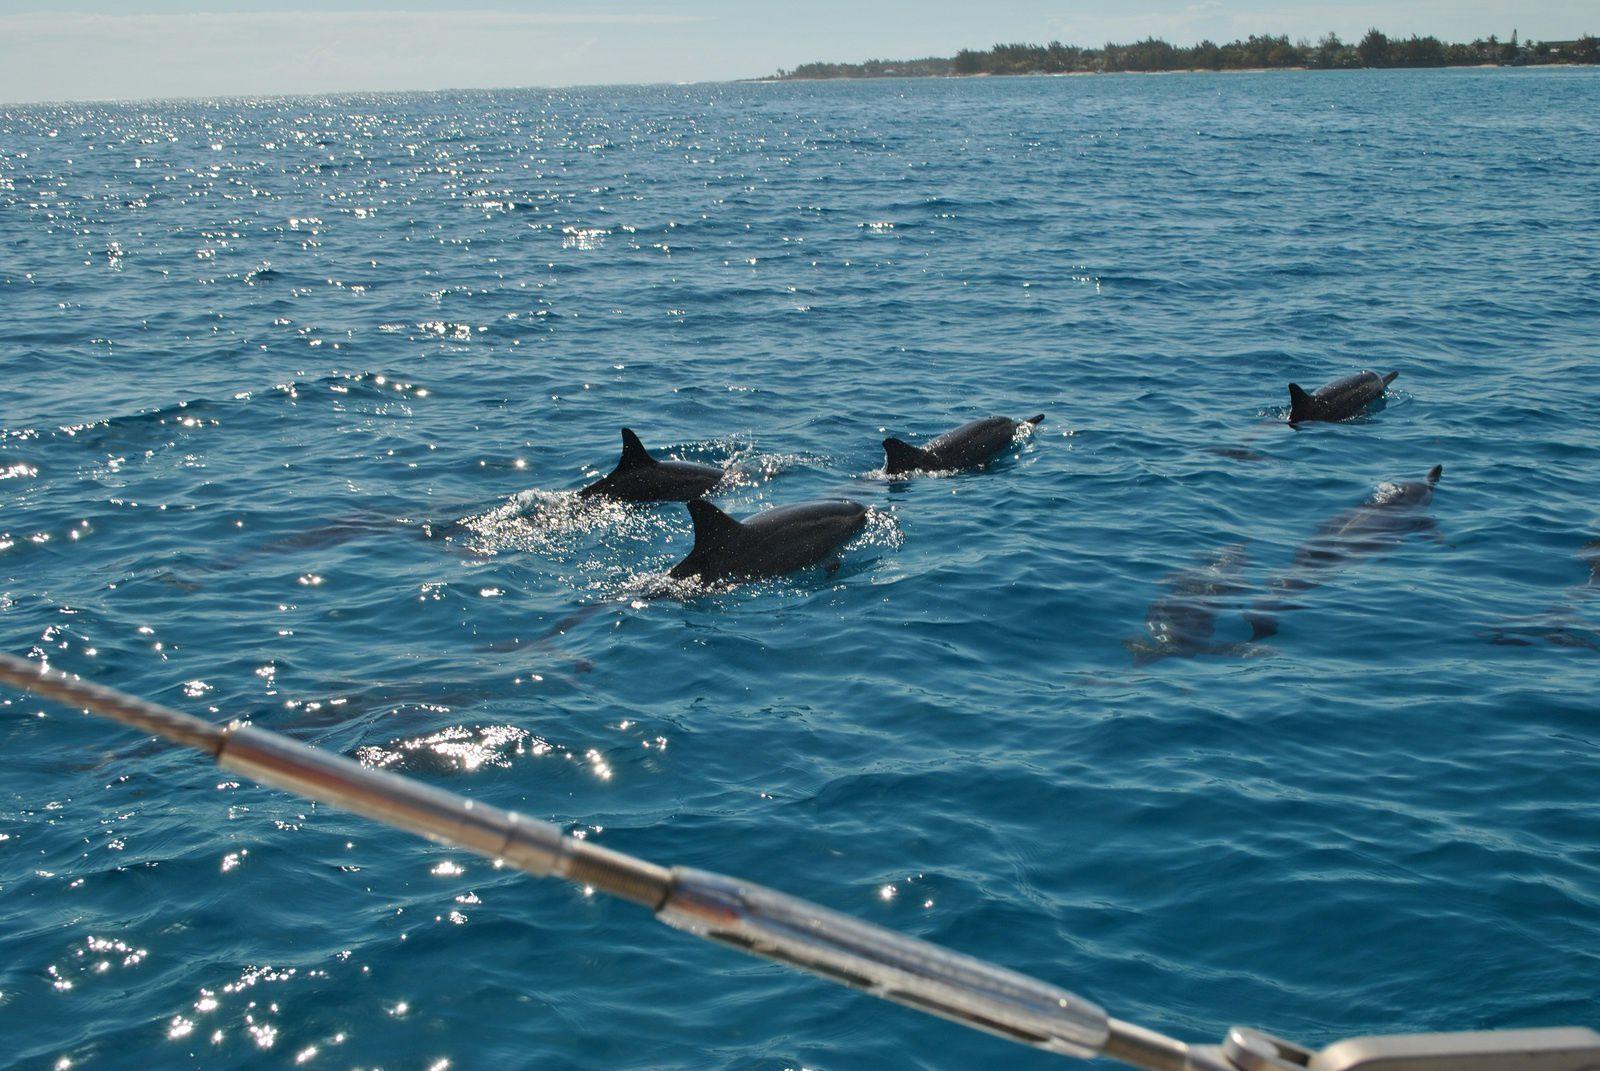 Les dauphins de la baie de tamarin